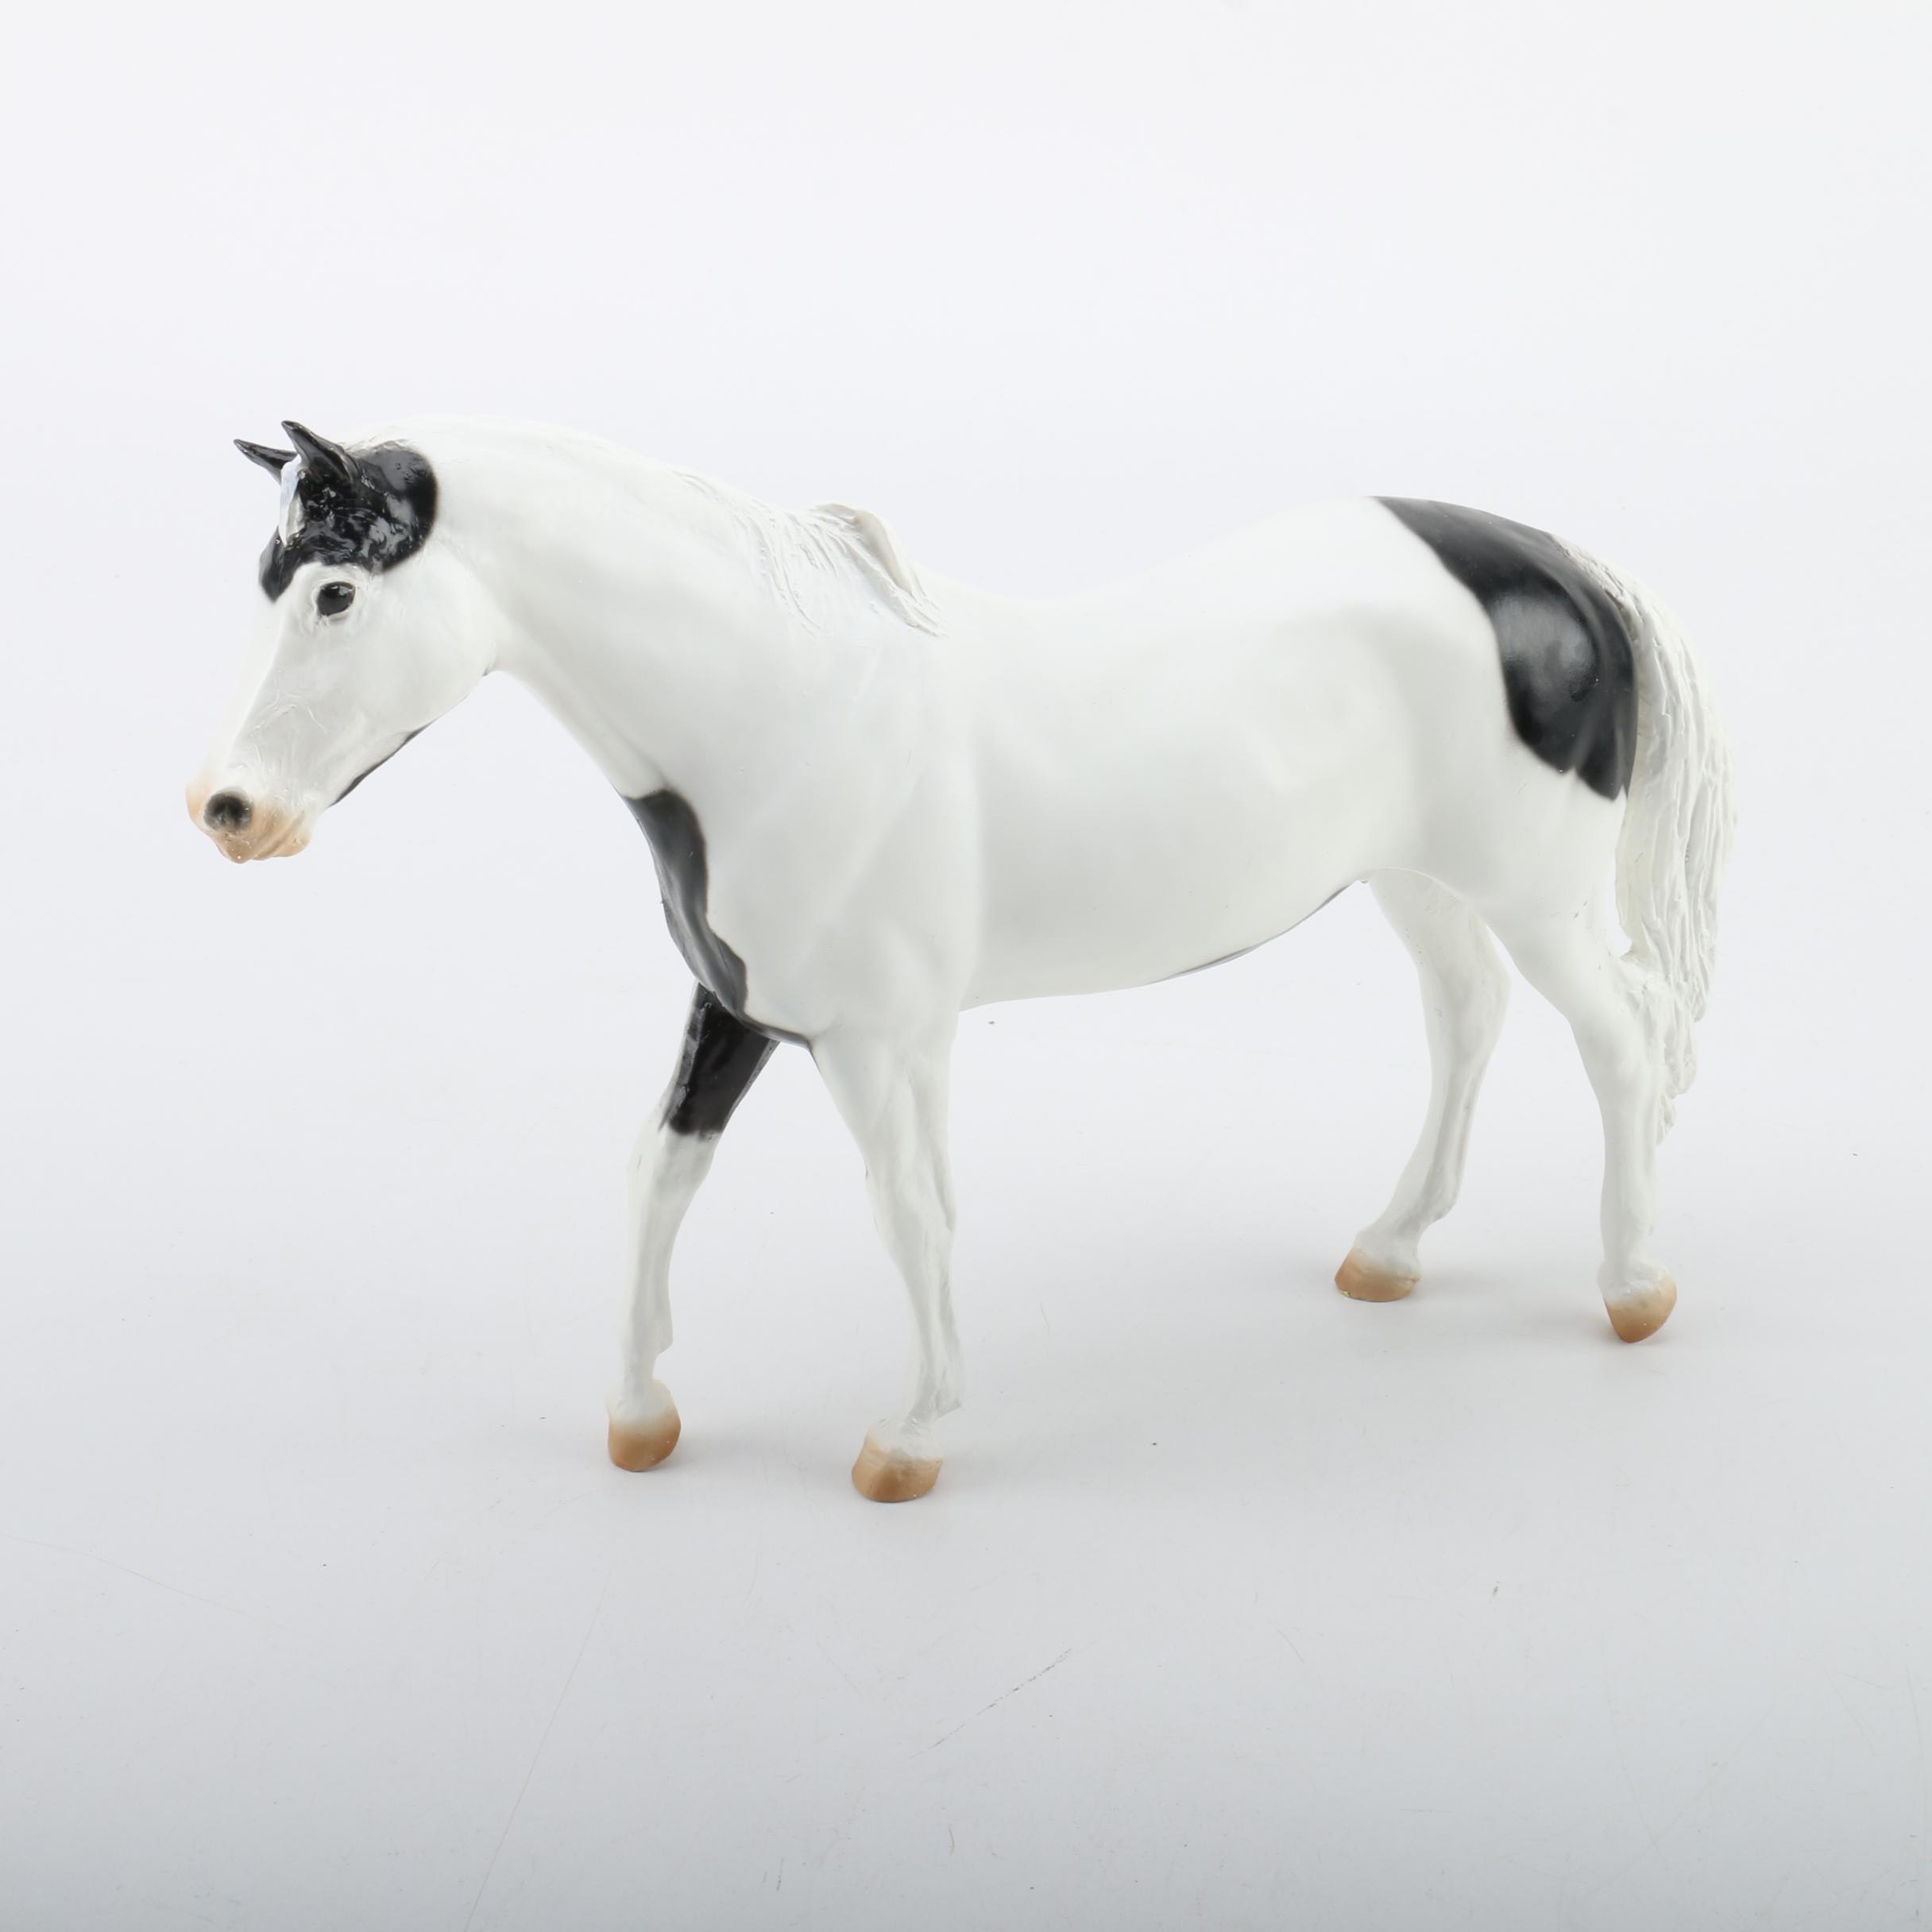 Limited Edition Porcelain Horse Figurine